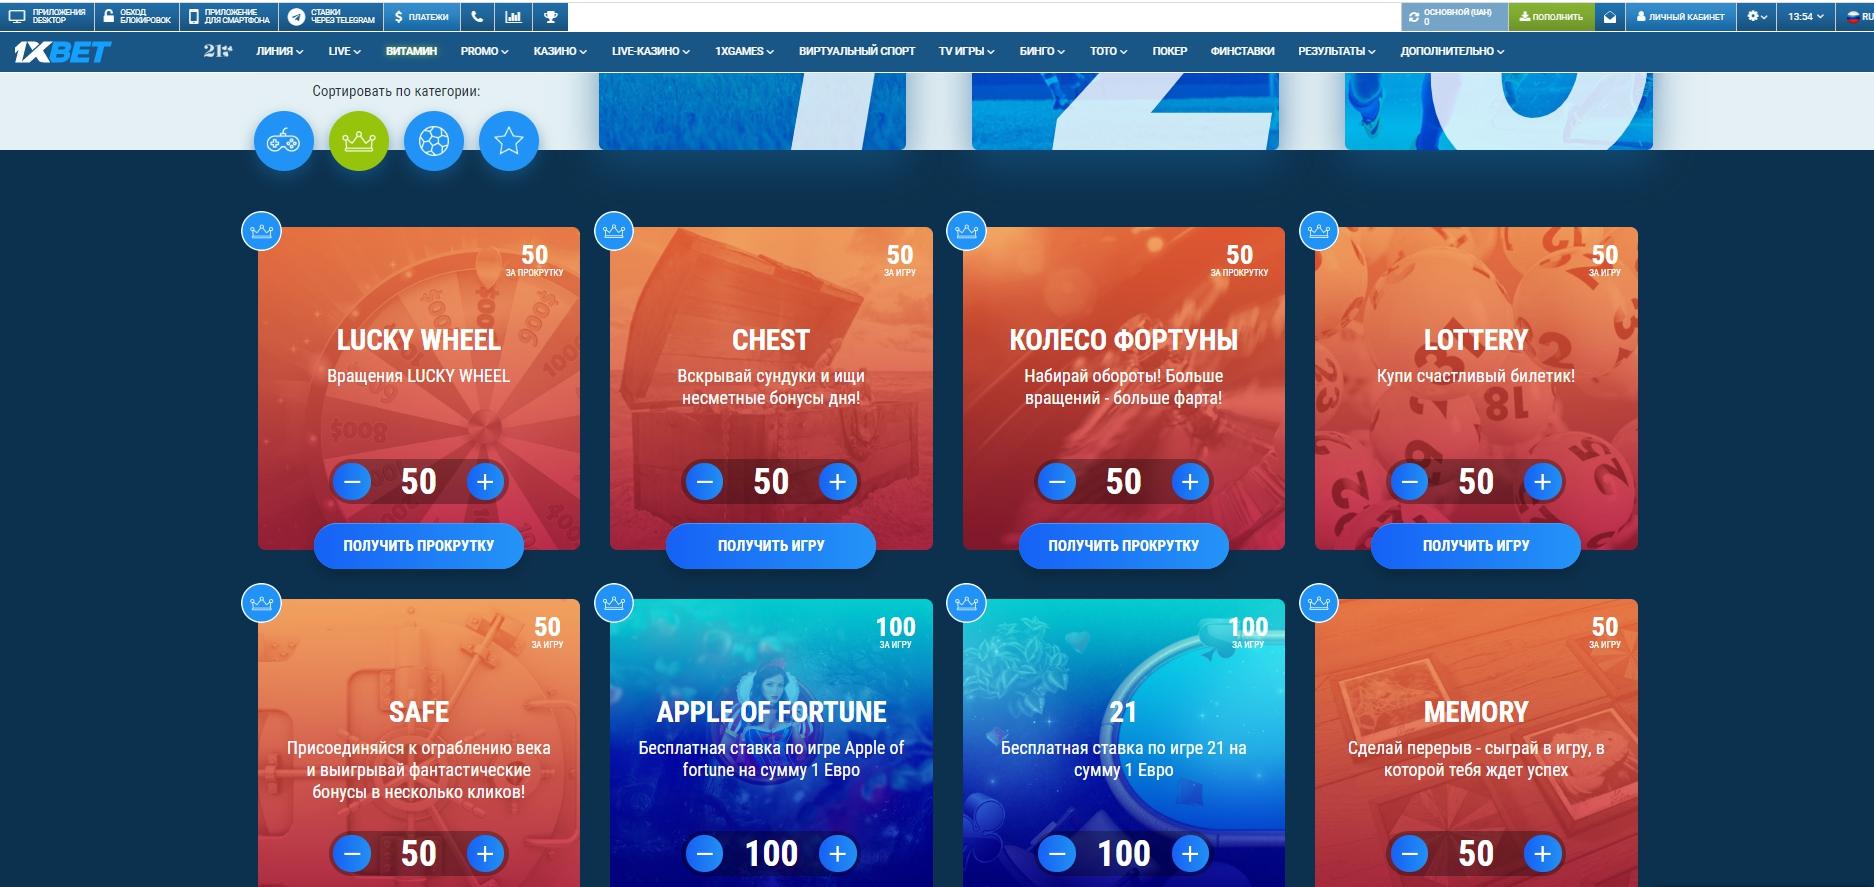 Промокод 1xBet на 2021 год - рабочие бонус коды от 1хБет